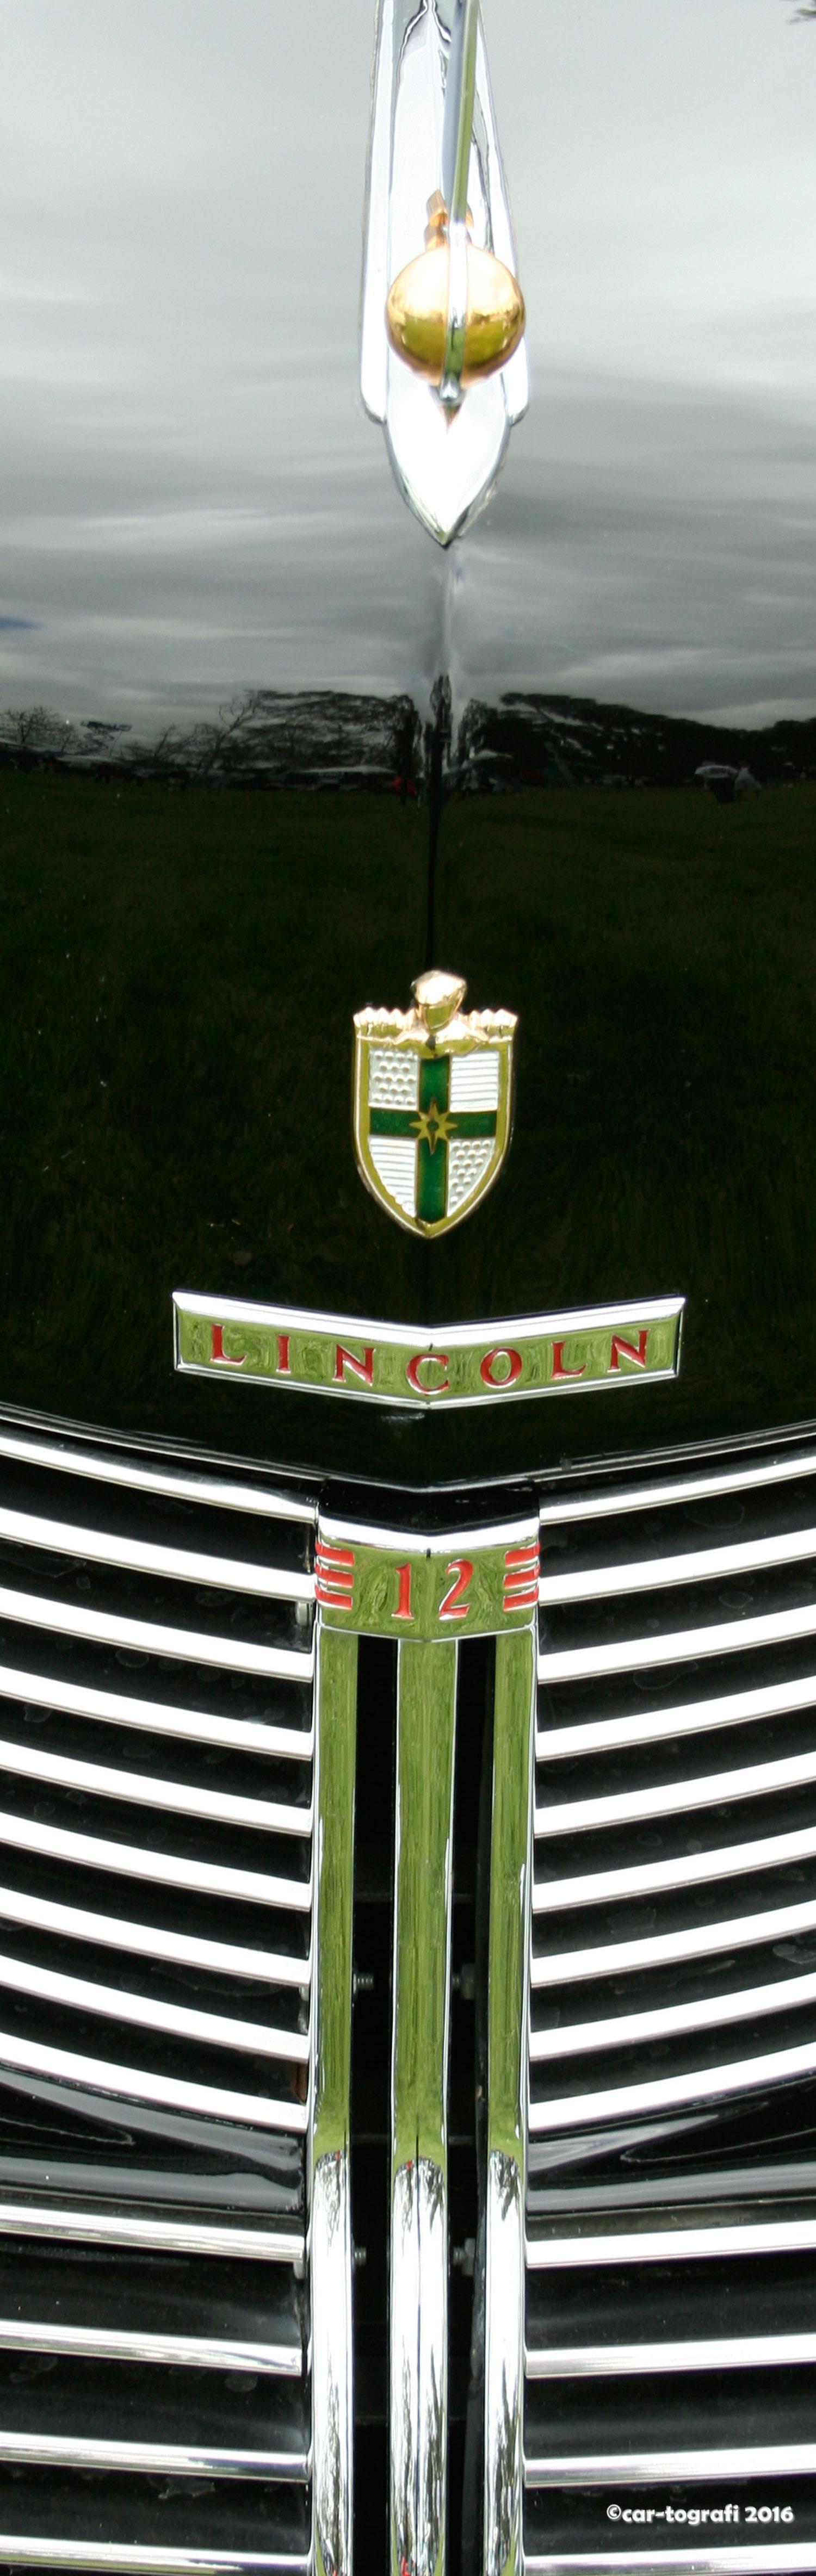 gril-linc-car-tografi.jpg